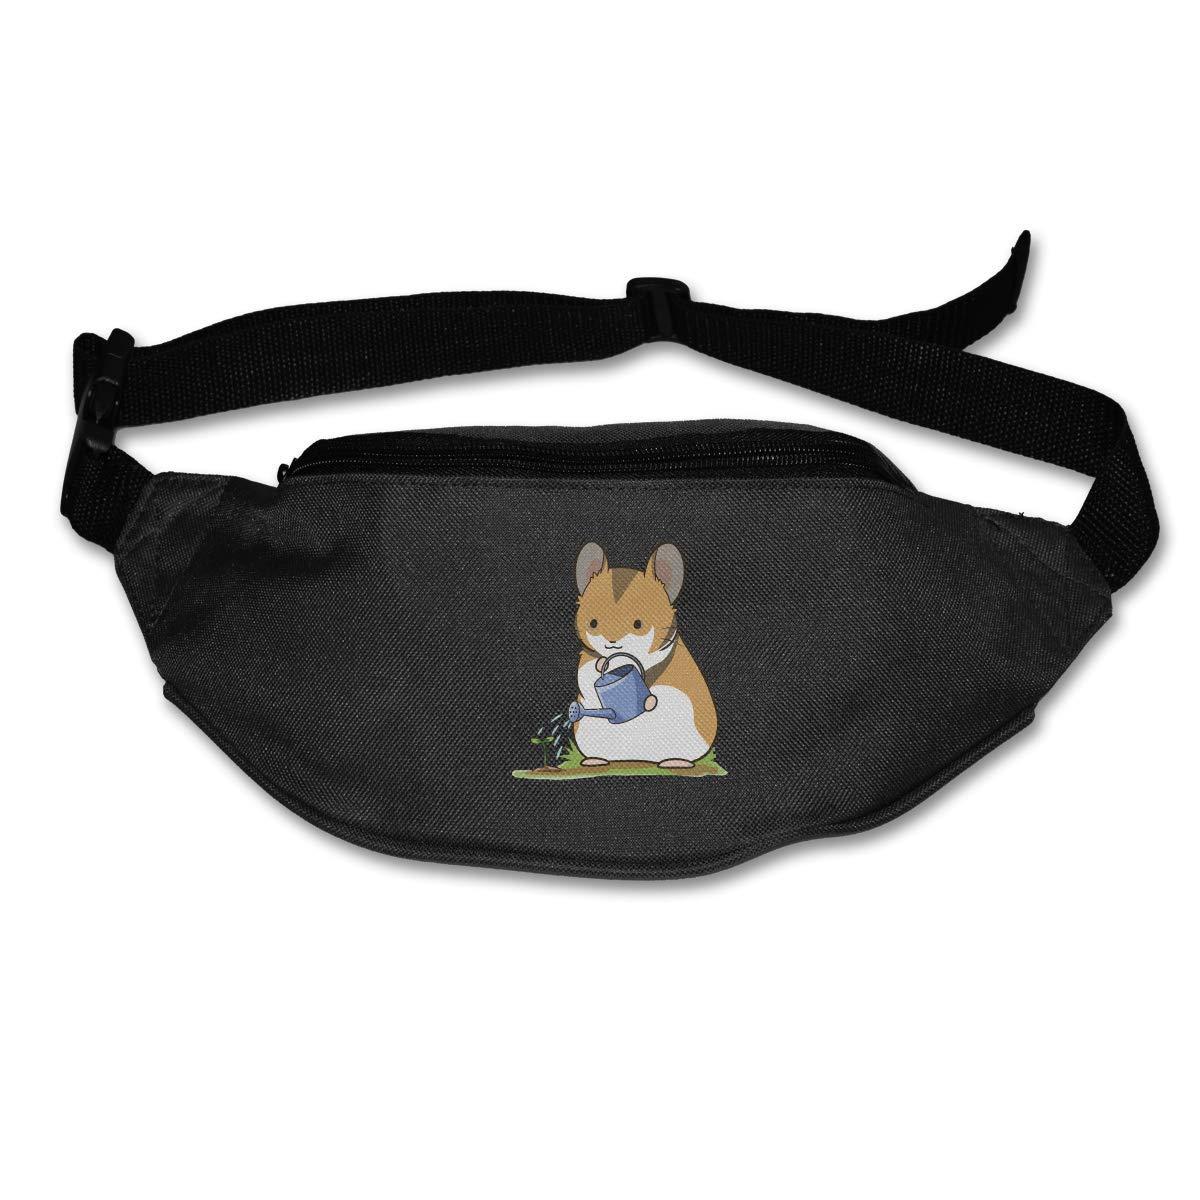 Waist Purse Cute Hamster Watering Flowers Unisex Outdoor Sports Pouch Fitness Runners Waist Bags